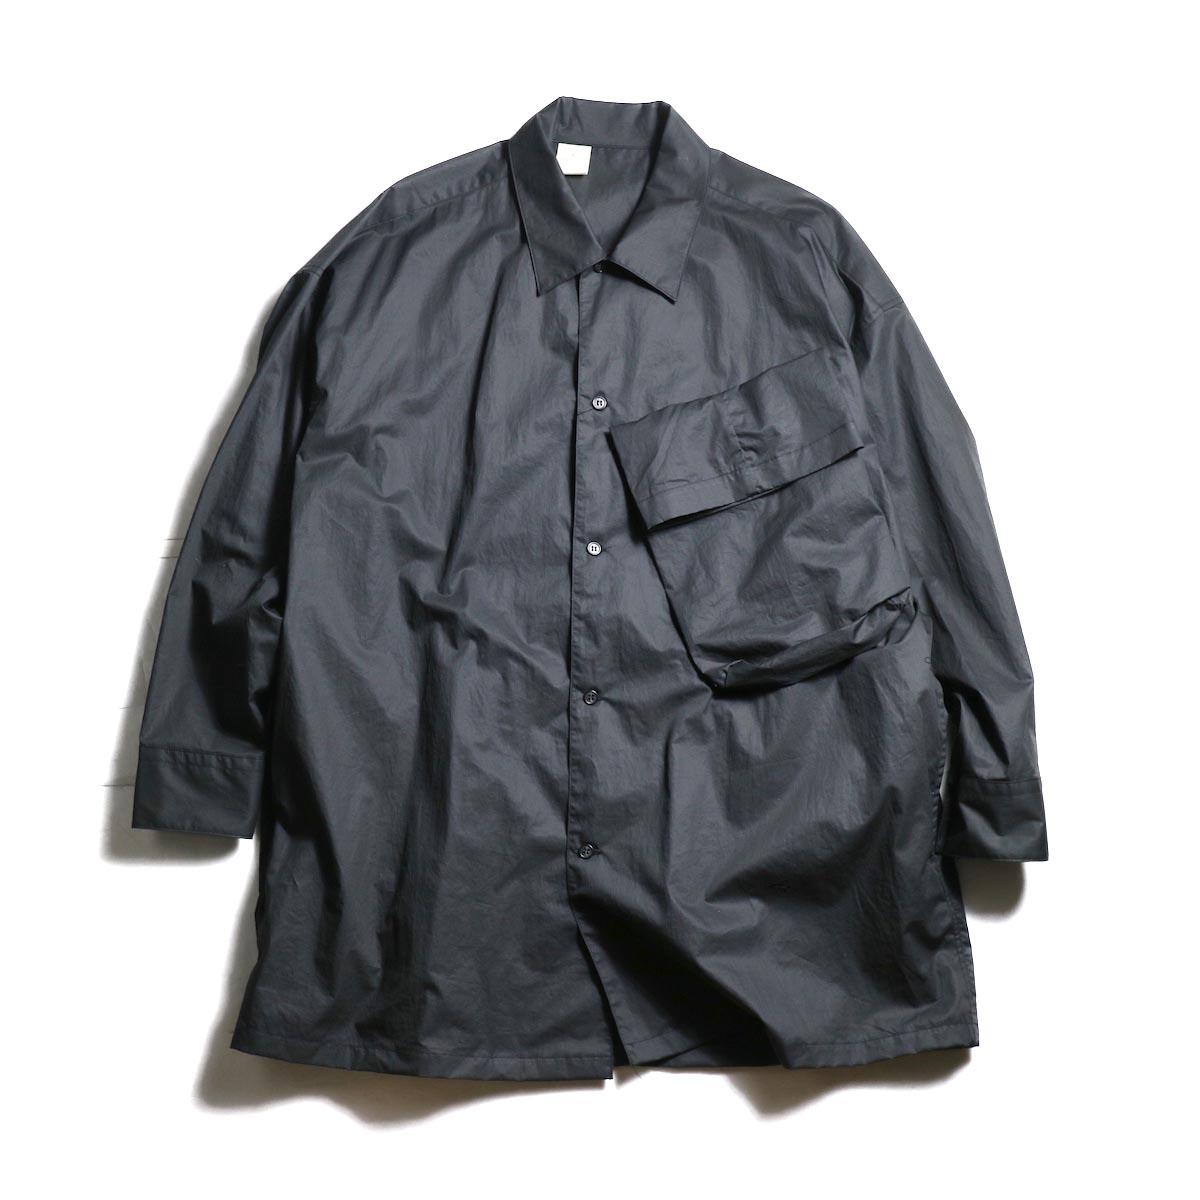 N.HOOLYWOOD / 1201-BL08-005 Shirts Blouson (Black)